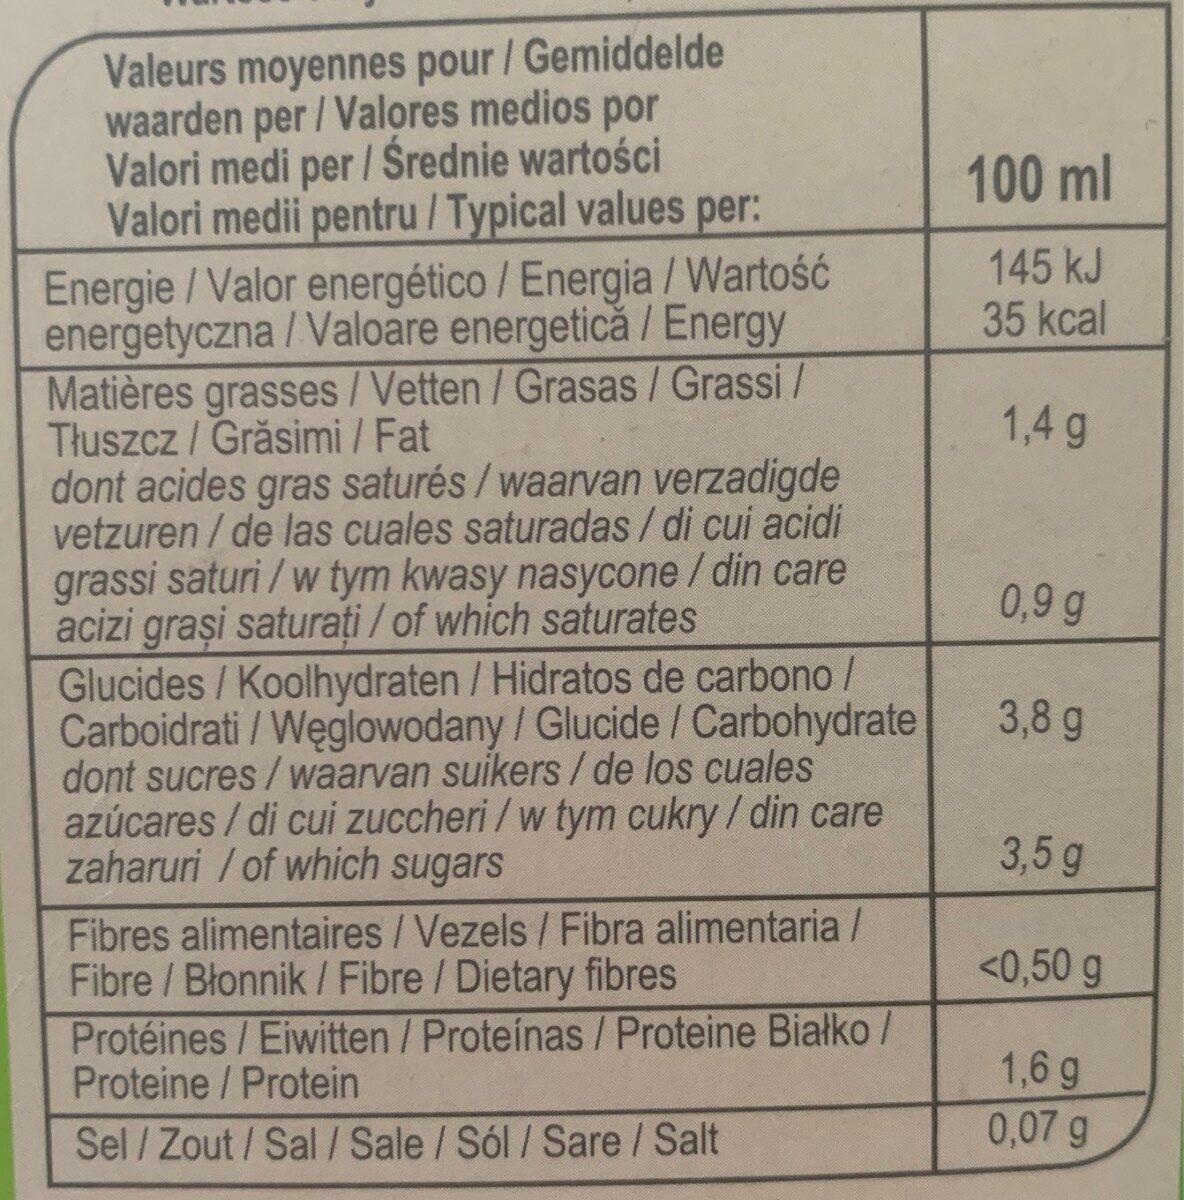 Cappucino carrefour extra compatible dolce gusto - Valori nutrizionali - fr